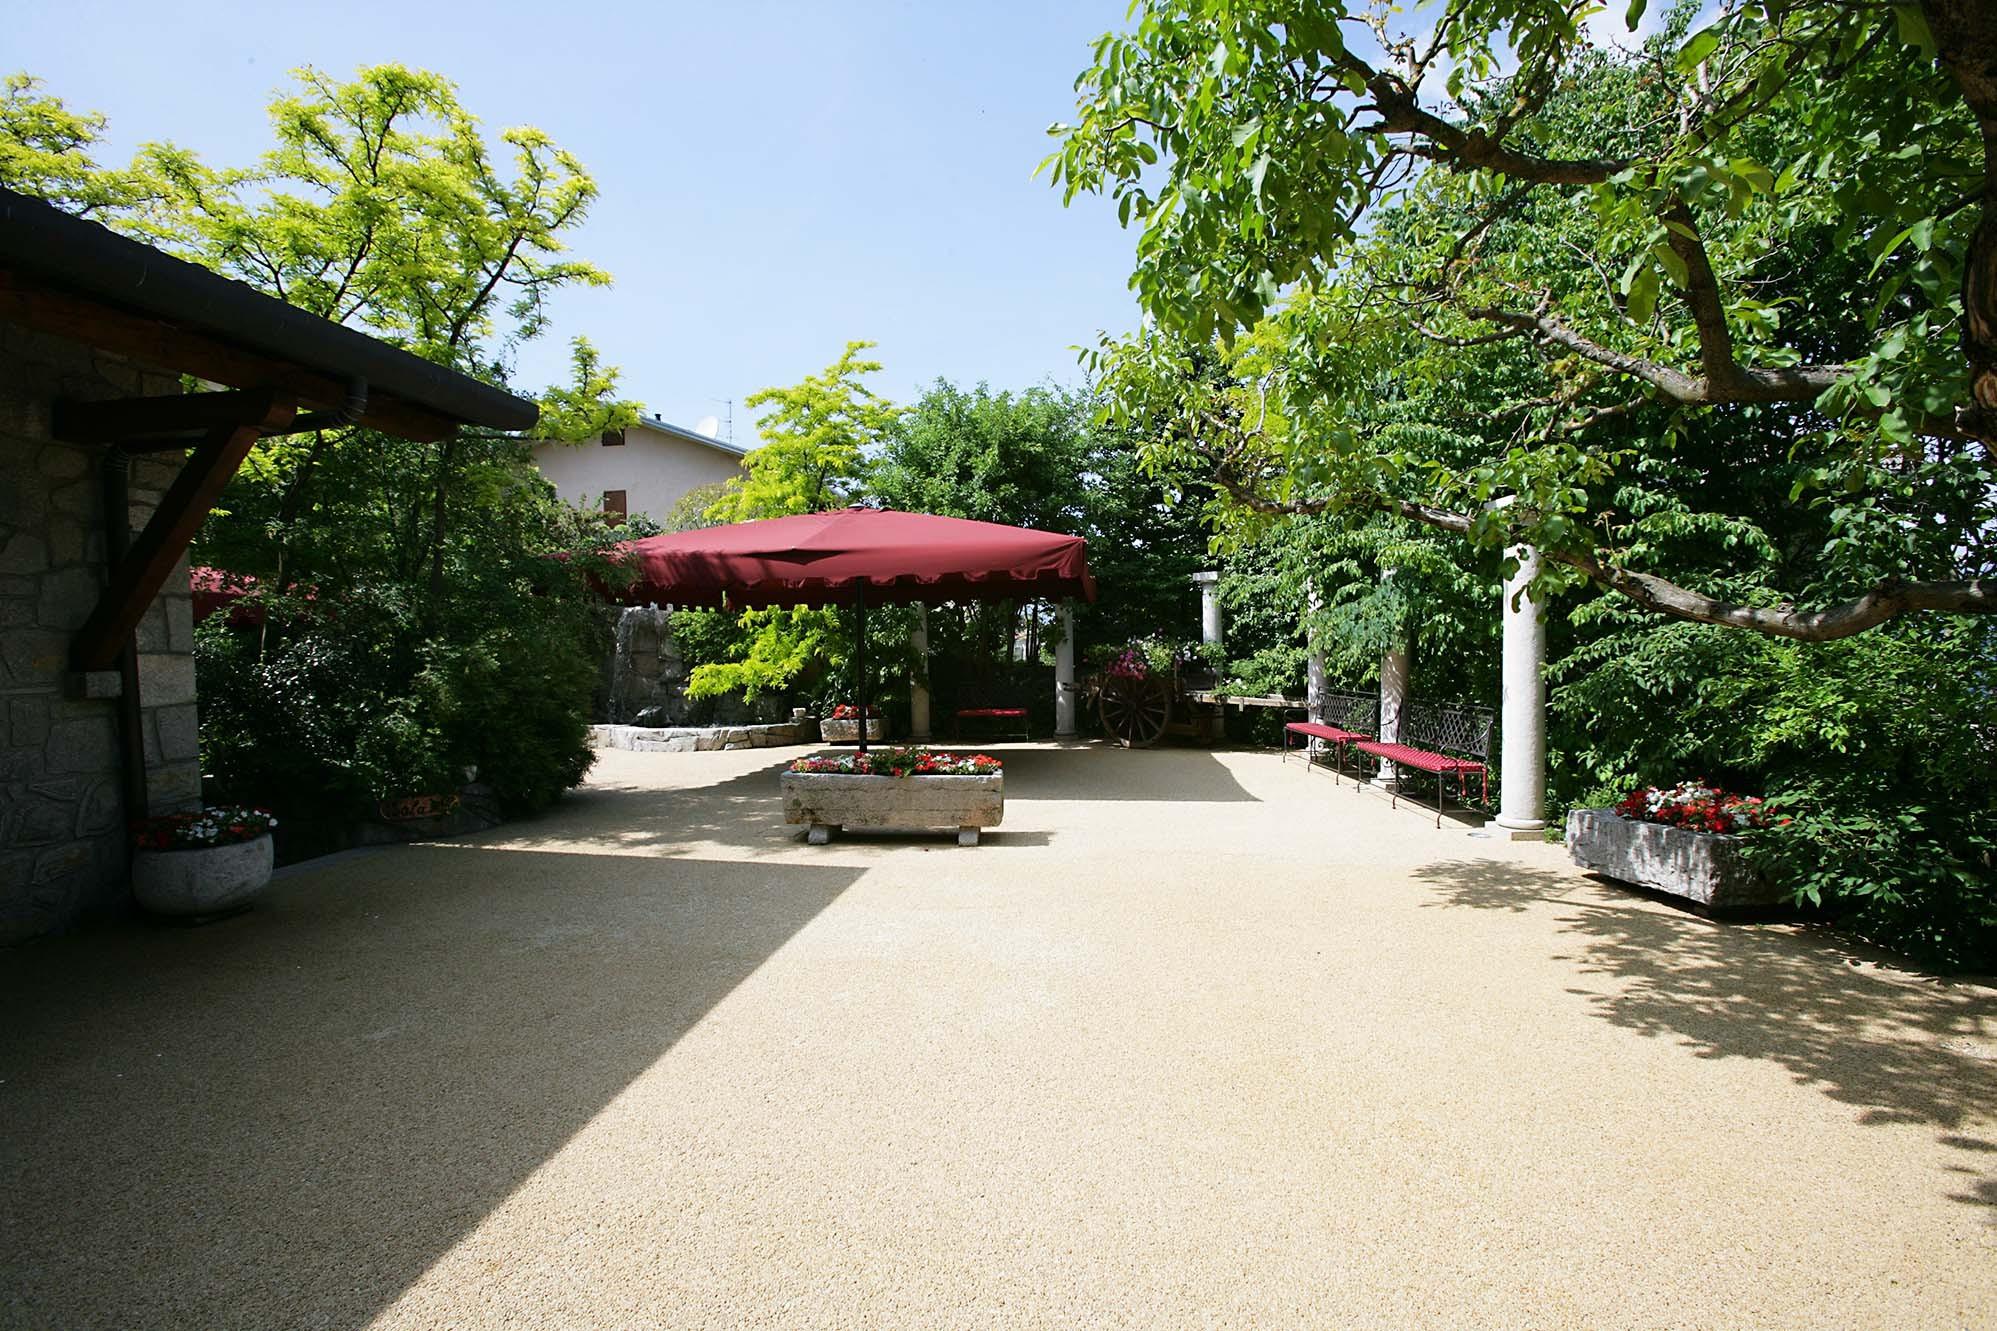 Roncola restaurant - هتل ها